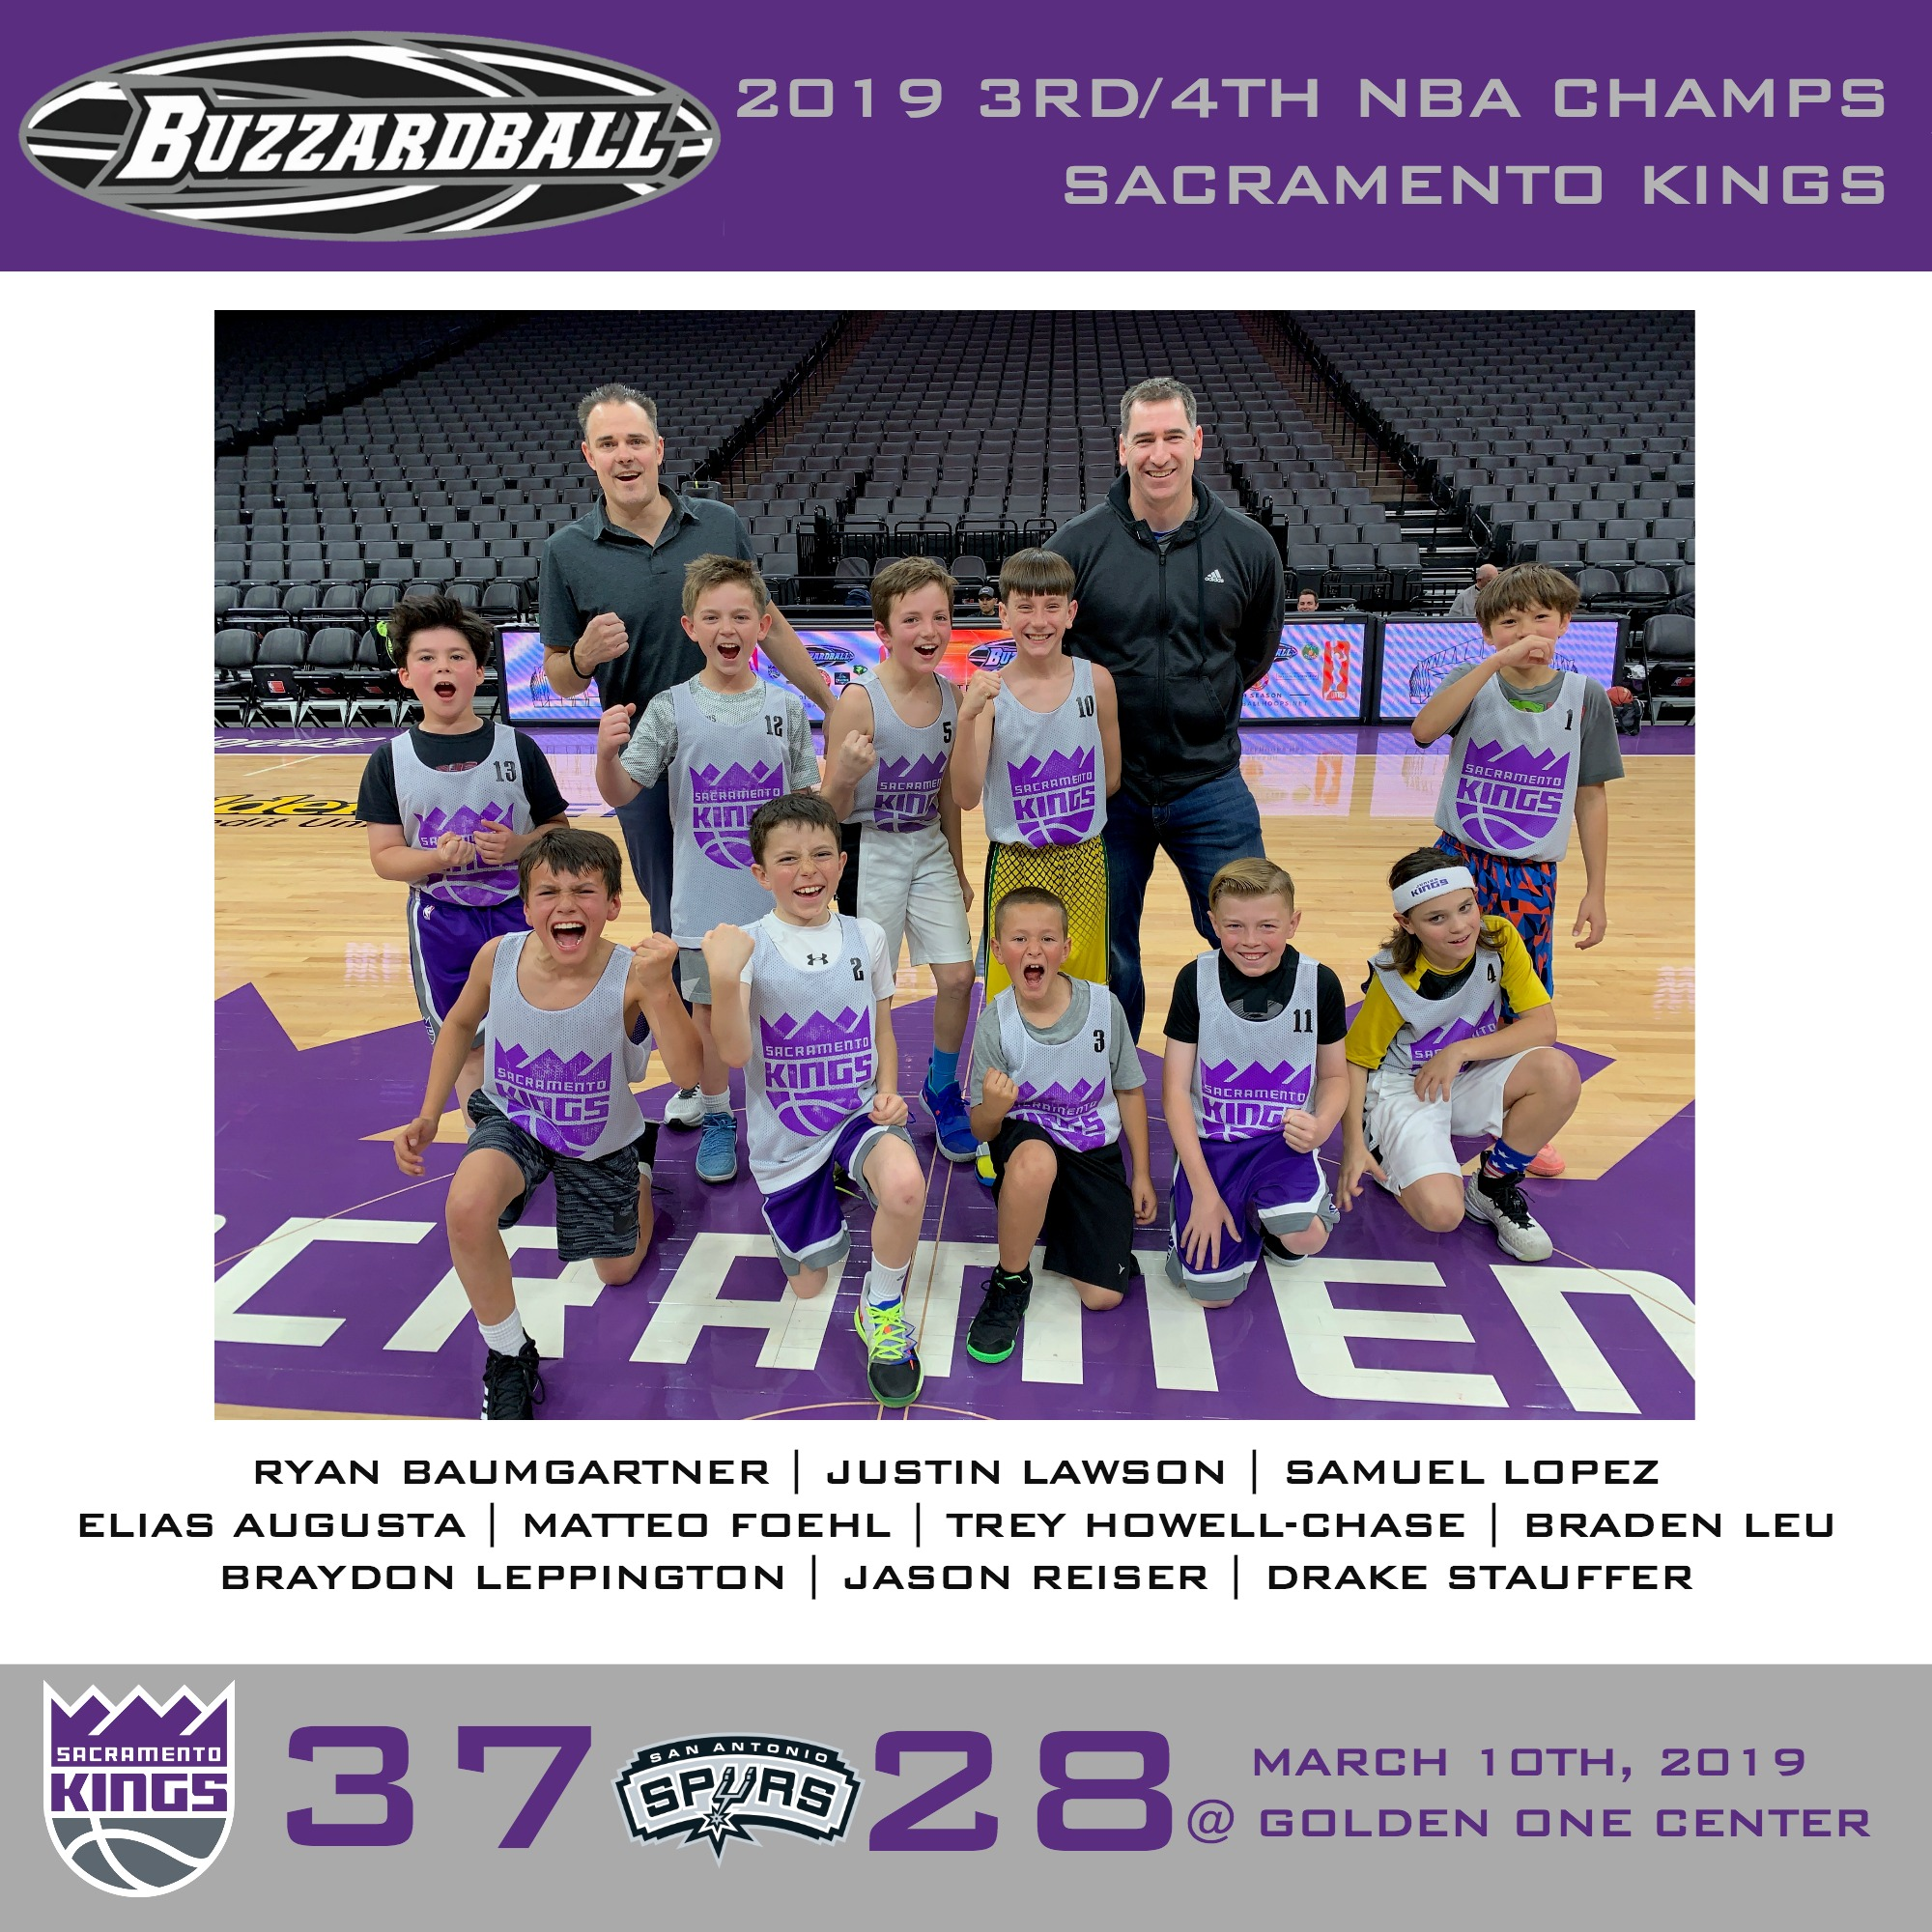 34 Champs Sacramento Kings.jpg